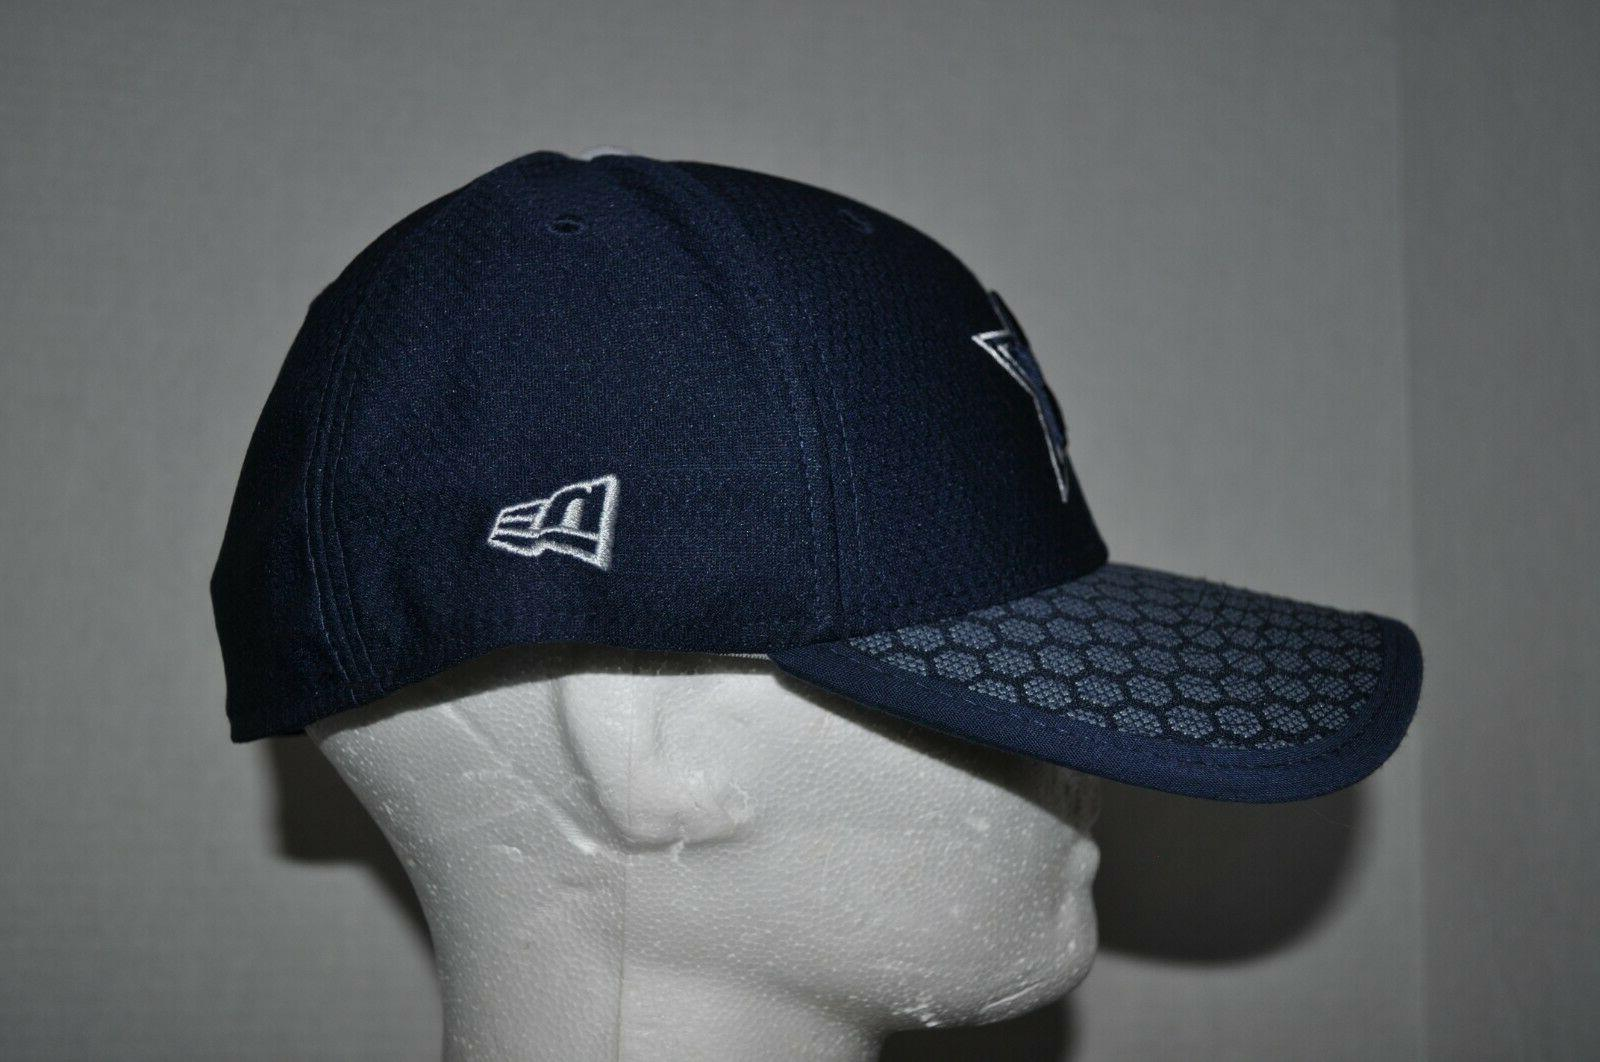 Dallas Cowboys New Era 39FIFTY Navy Baseball Hat Cap